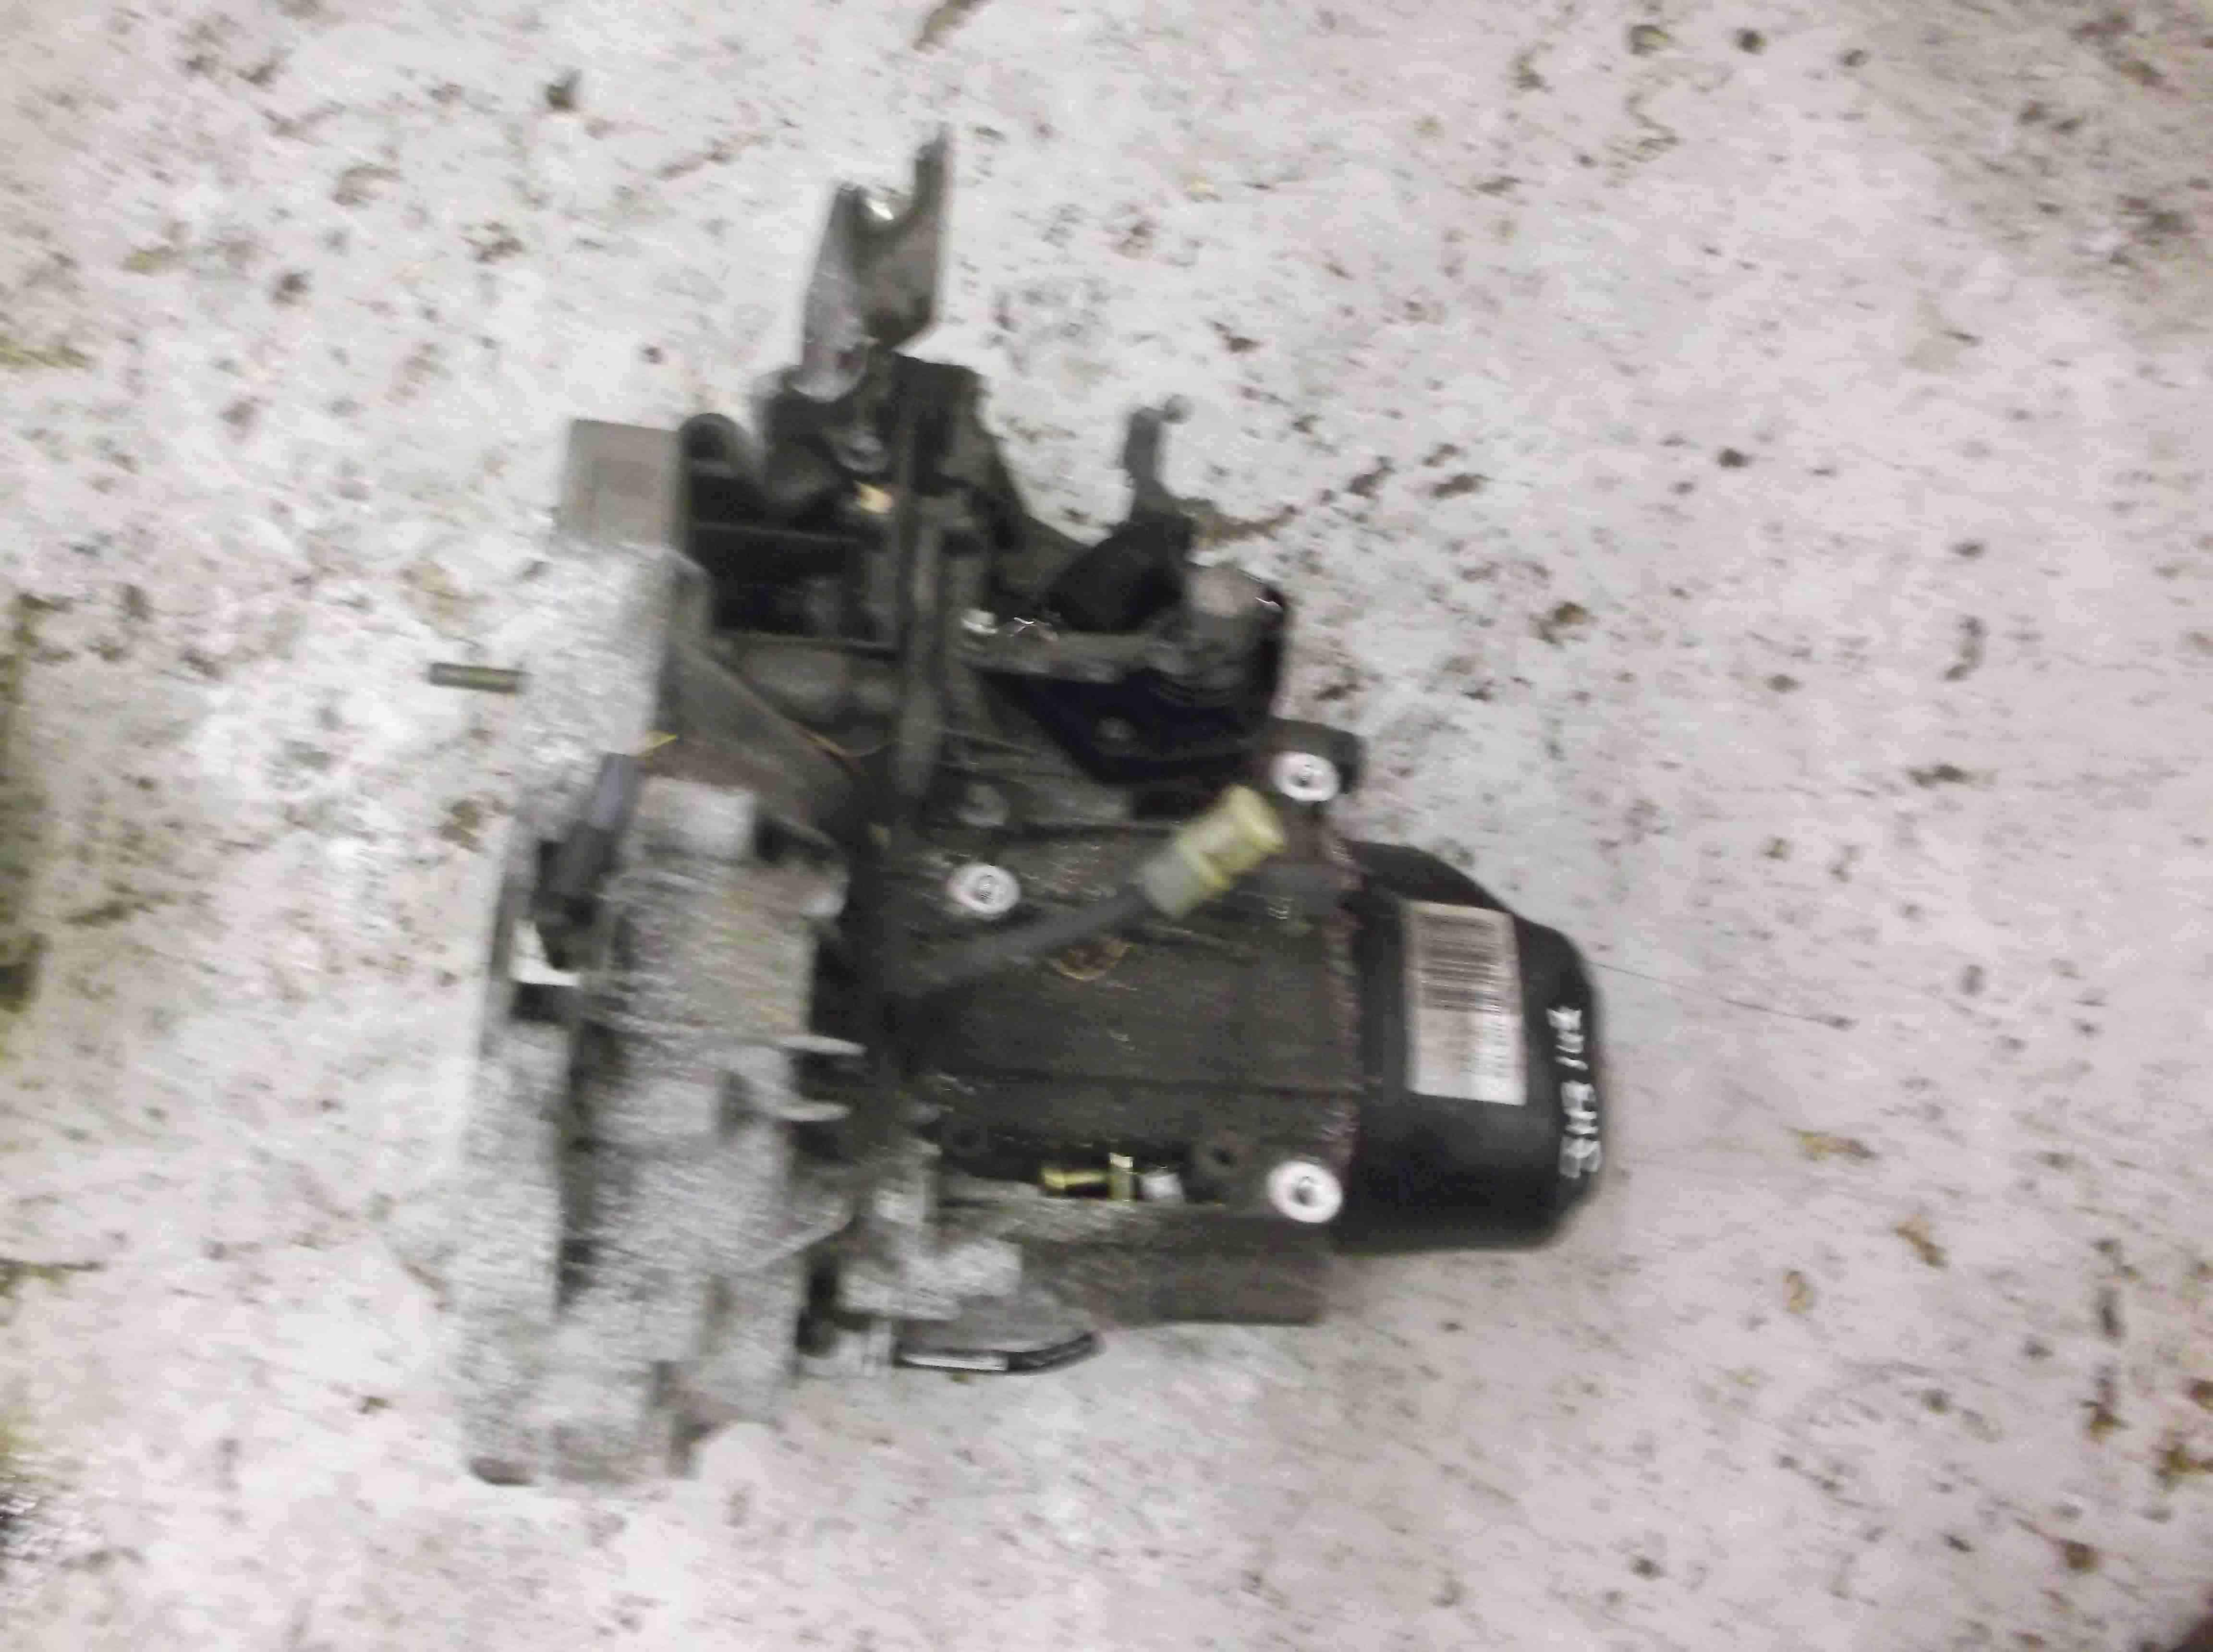 Renault Megane 2002-2008 1.6 16v Gearbox JH3 142 jh3142